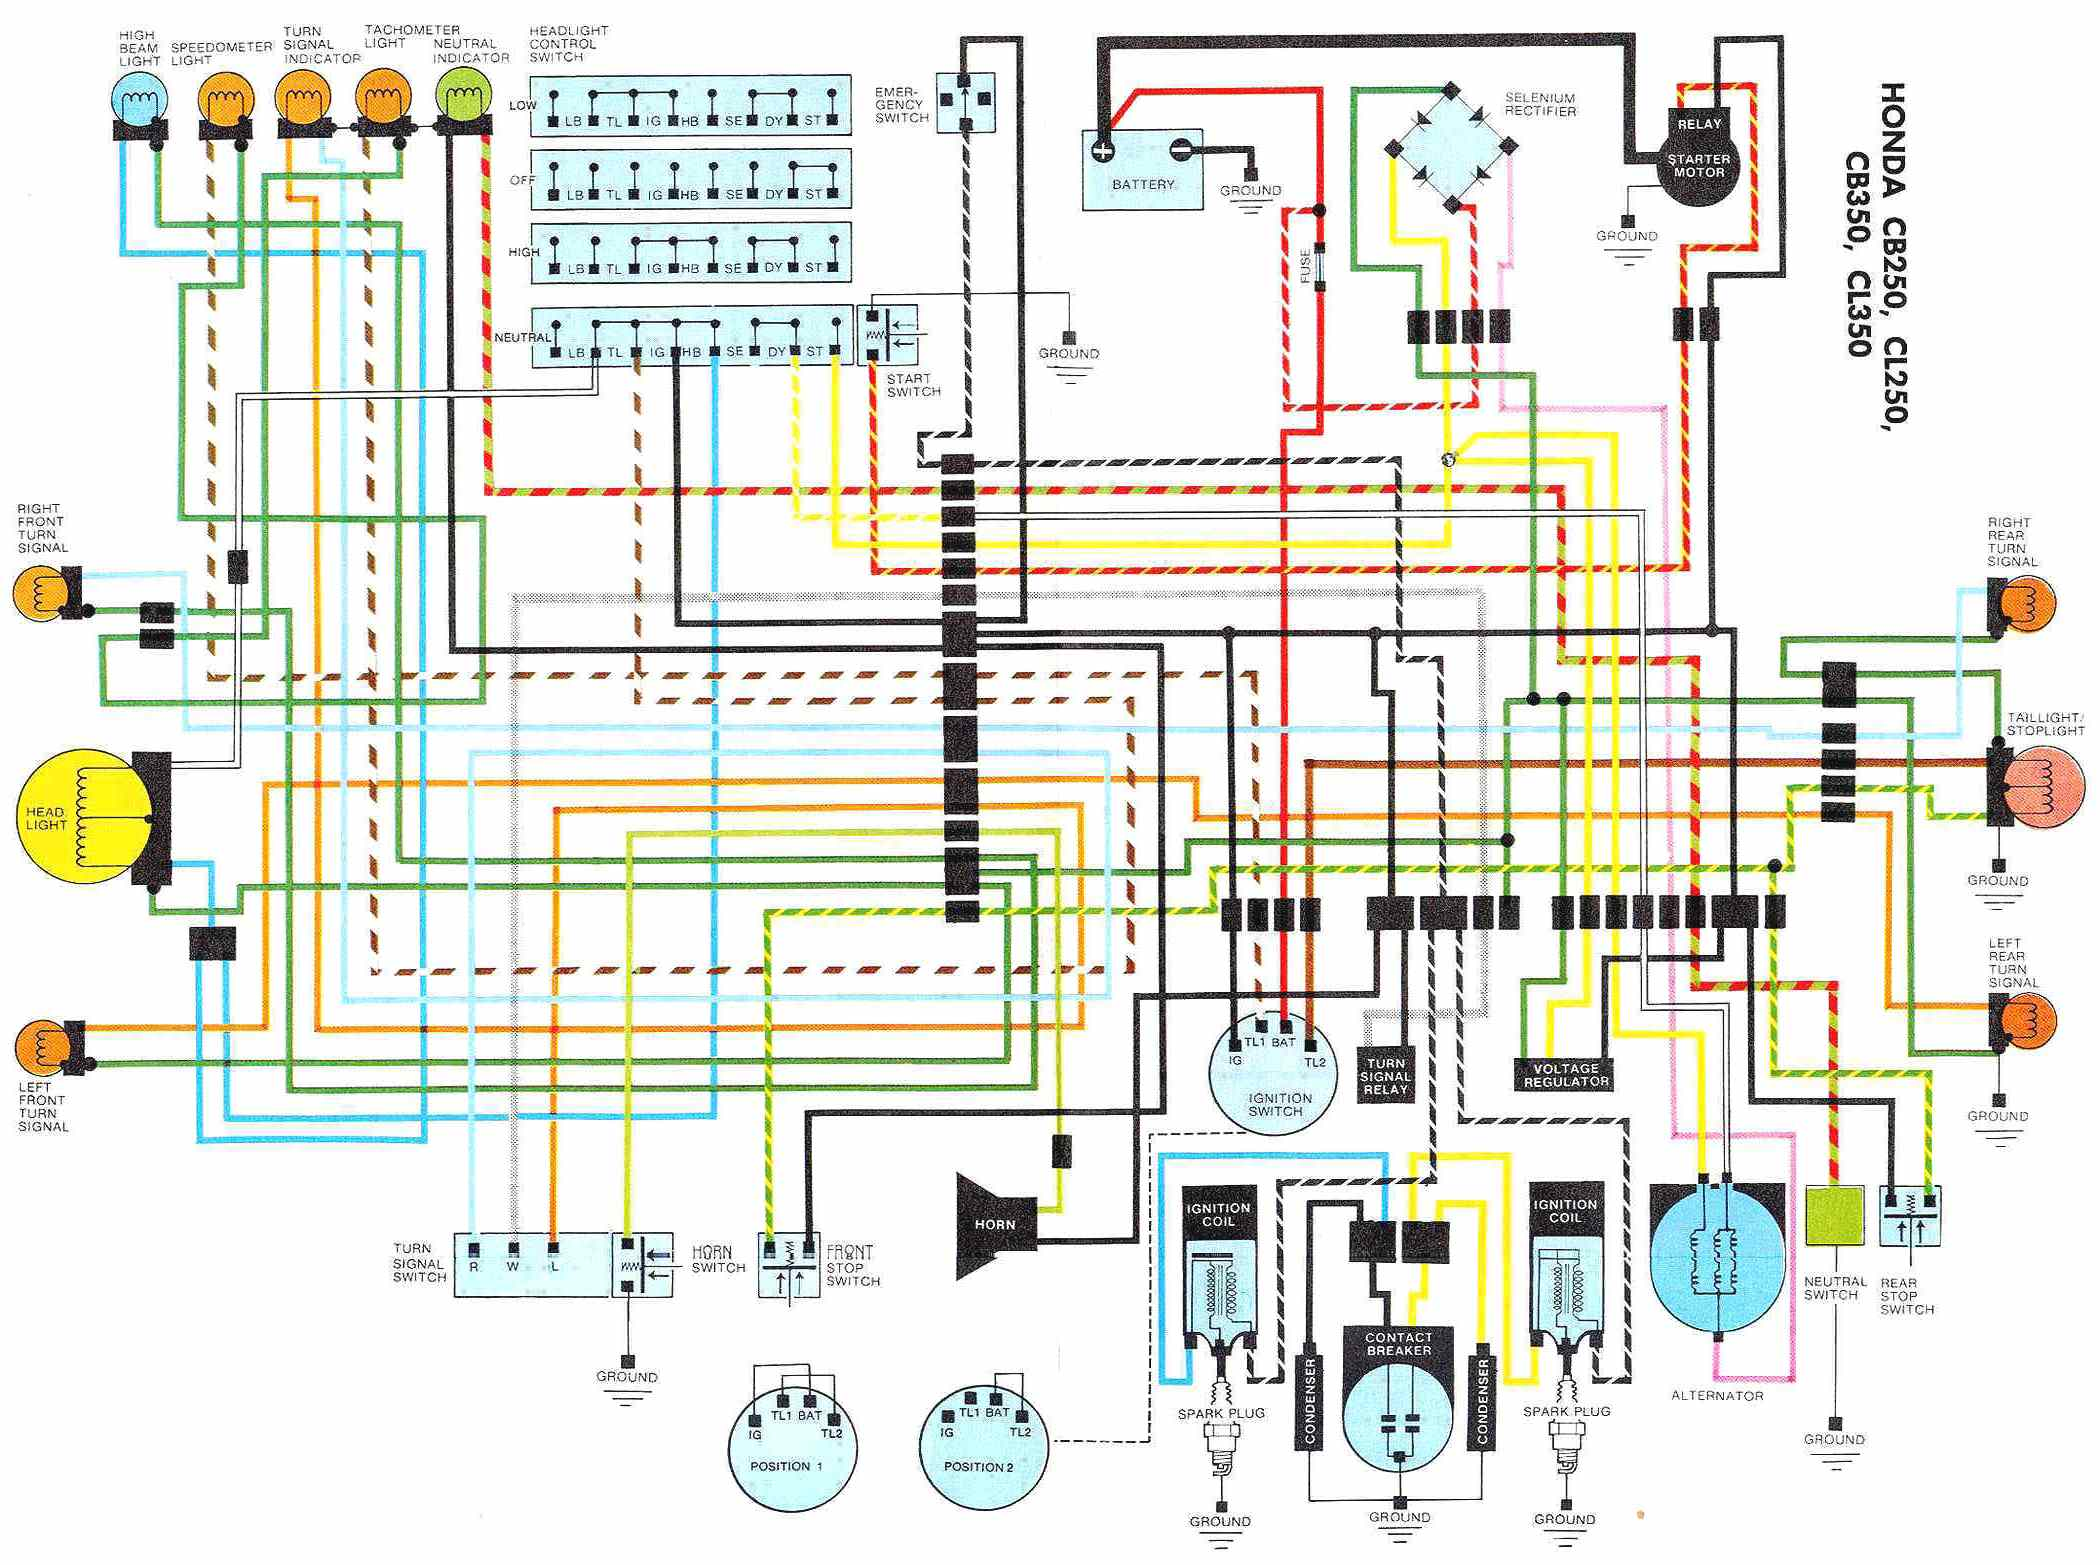 DIAGRAM] Honda Sl350 Wiring Diagram FULL Version HD Quality Wiring Diagram  - EXPERTELECTRICMO.ANTONELLABEVILACQUA.ITAntonellabevilacqua.it